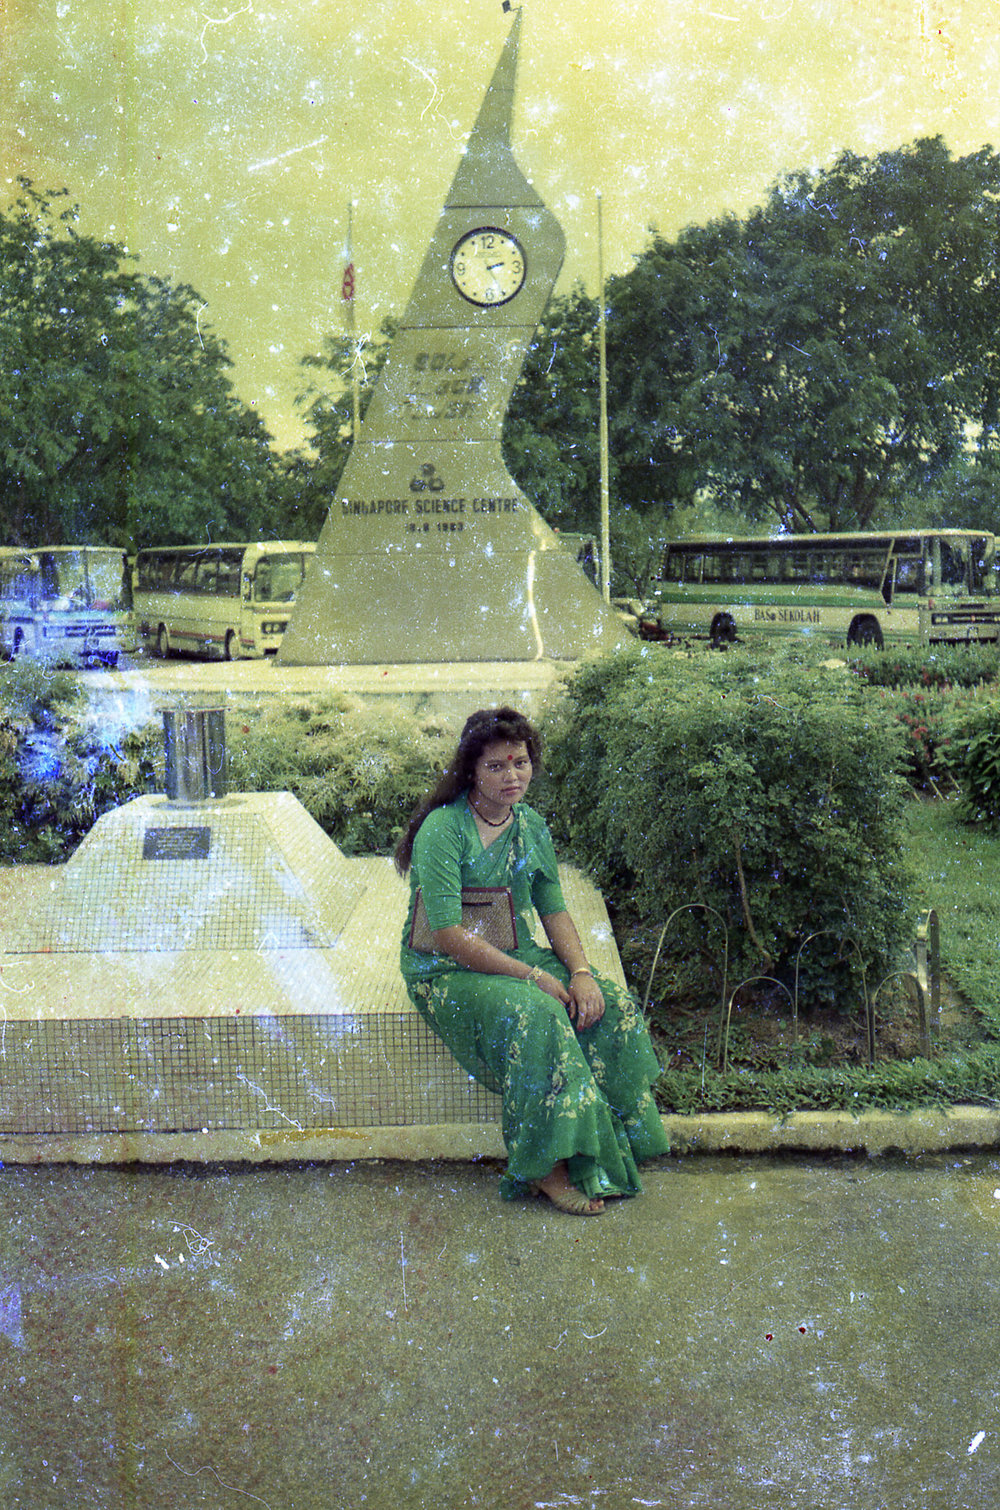 singapore-gurkhas-archive-photo-museum-zakaria-zainal-11.jpg